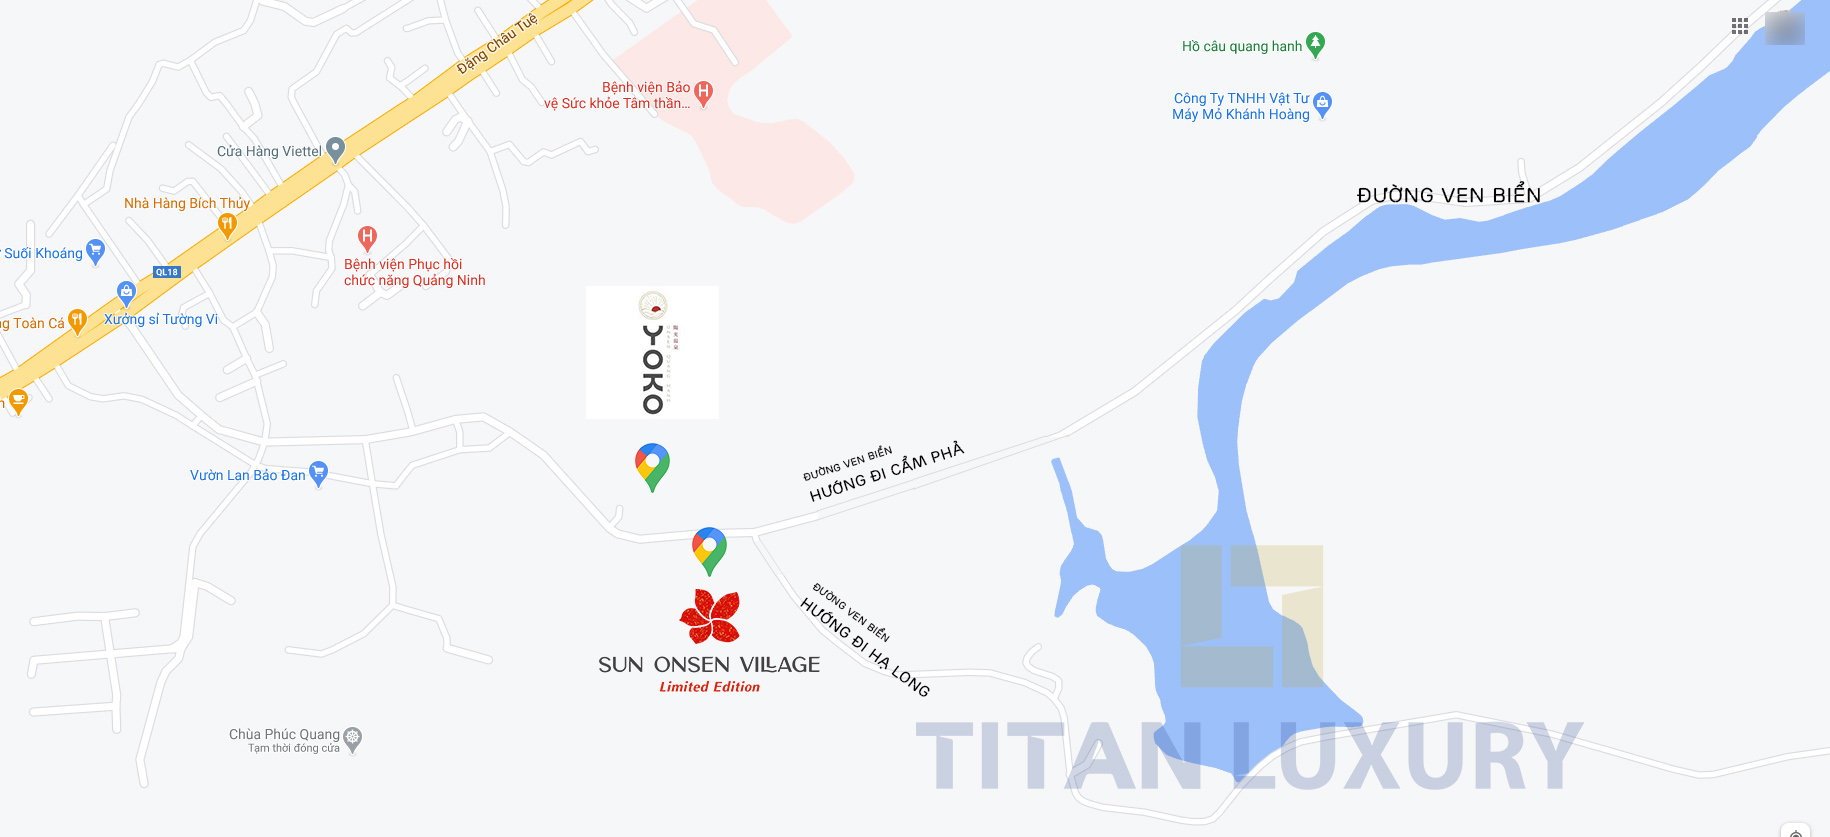 vi tri biet thu sun onsen village suoi khoang nong yoko onsen quang hanh o dau